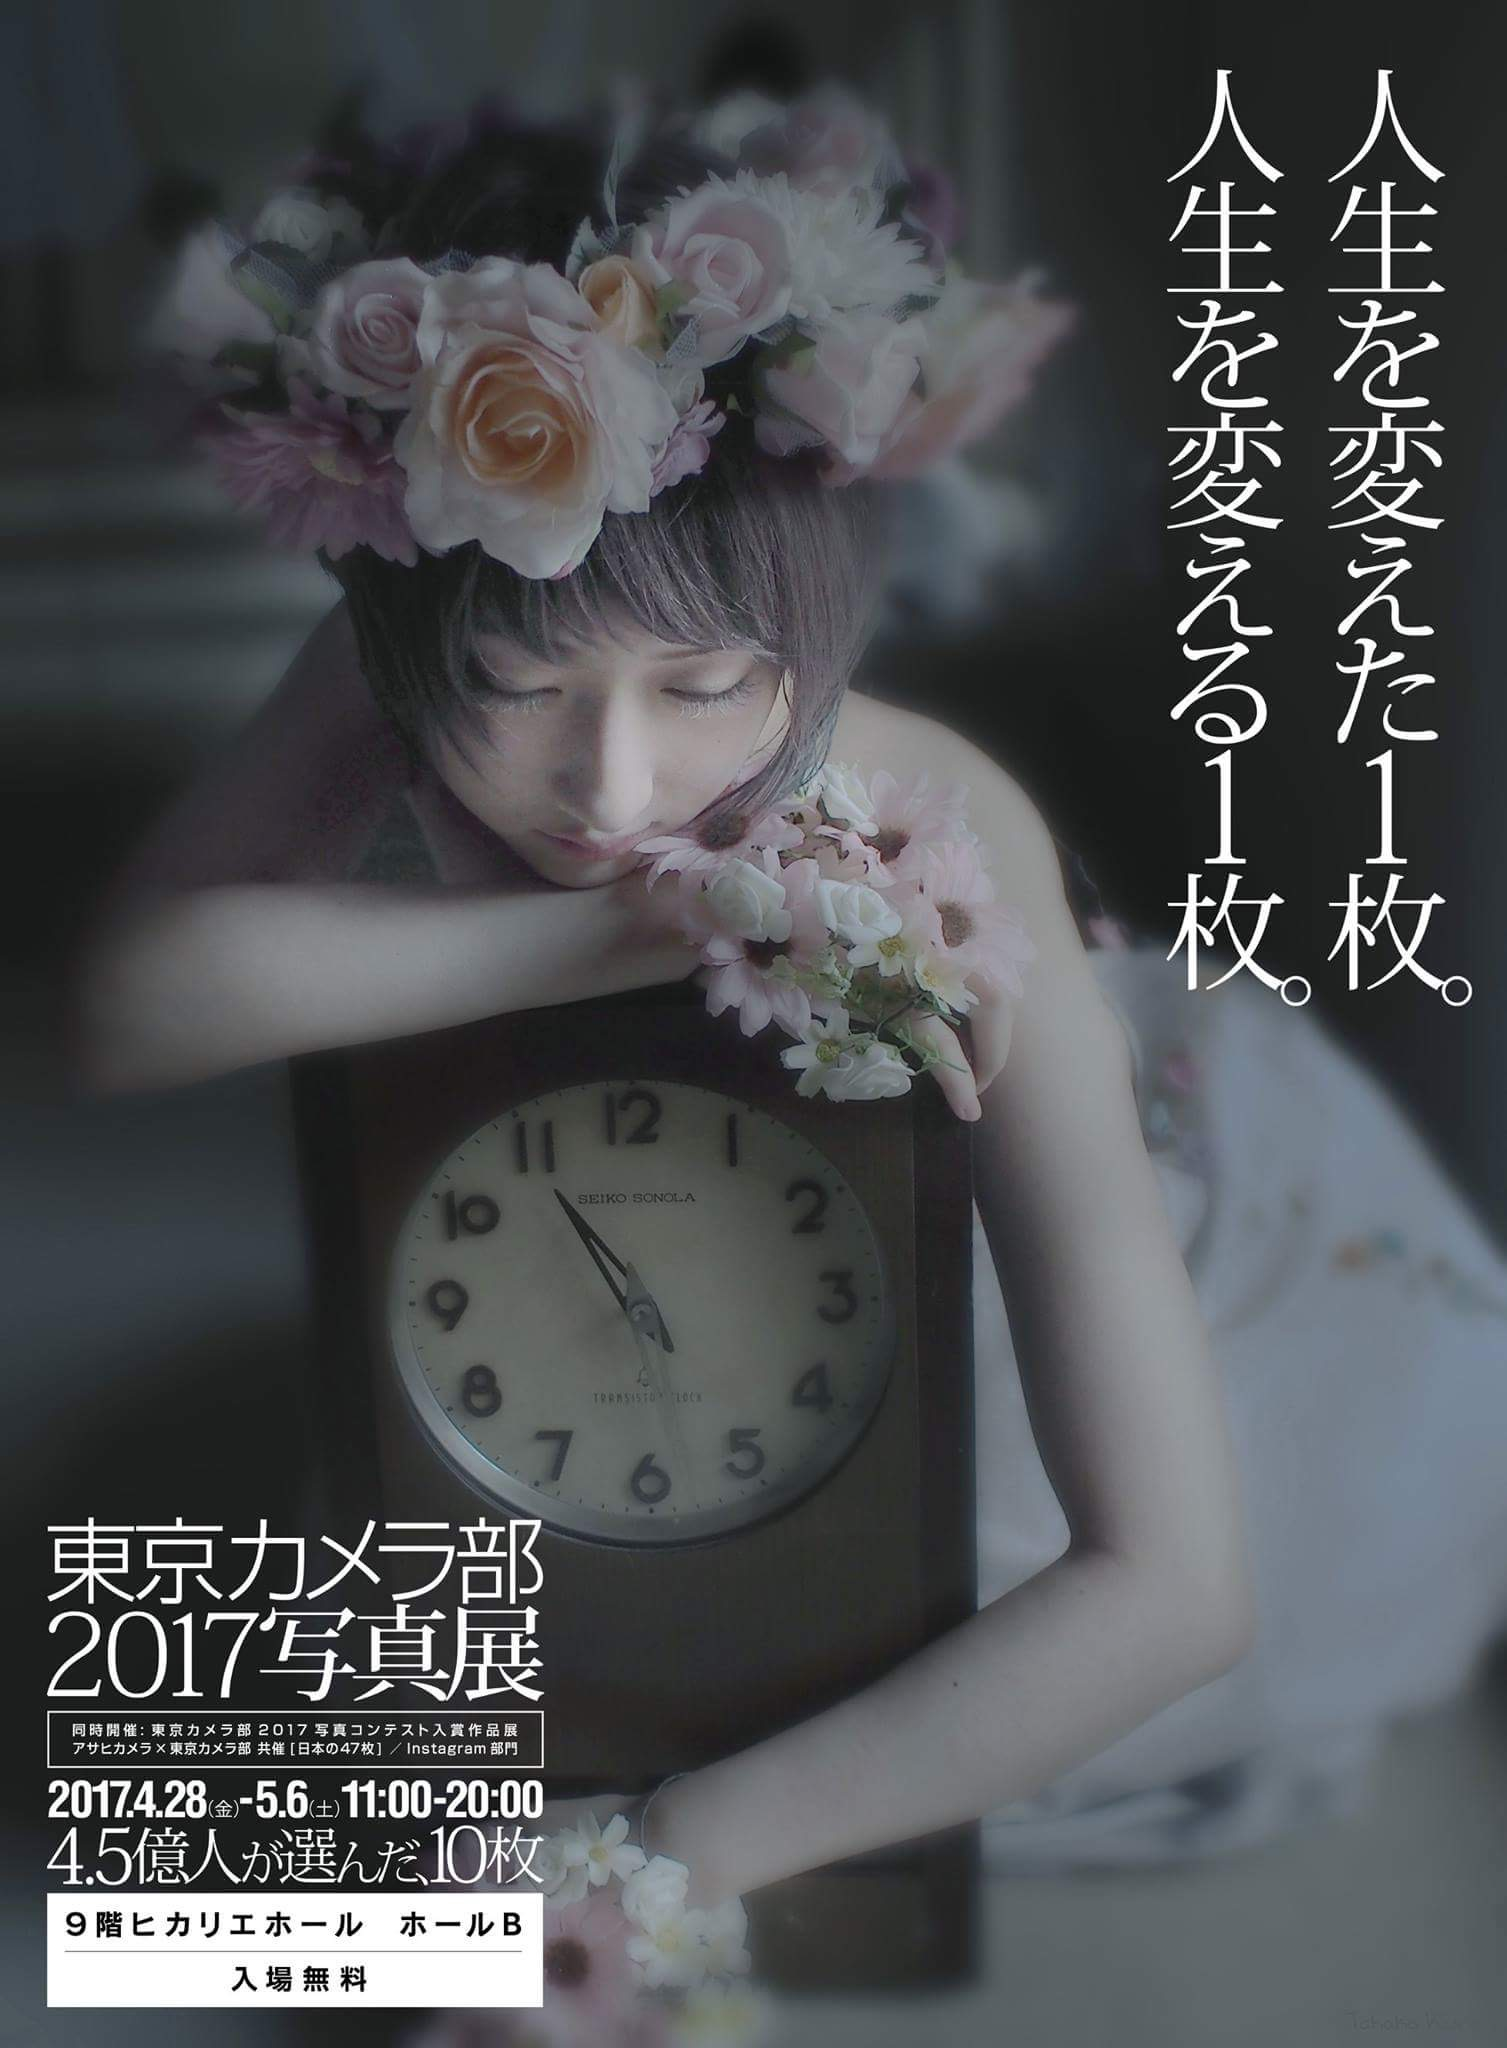 東京カメラ部 展示写真